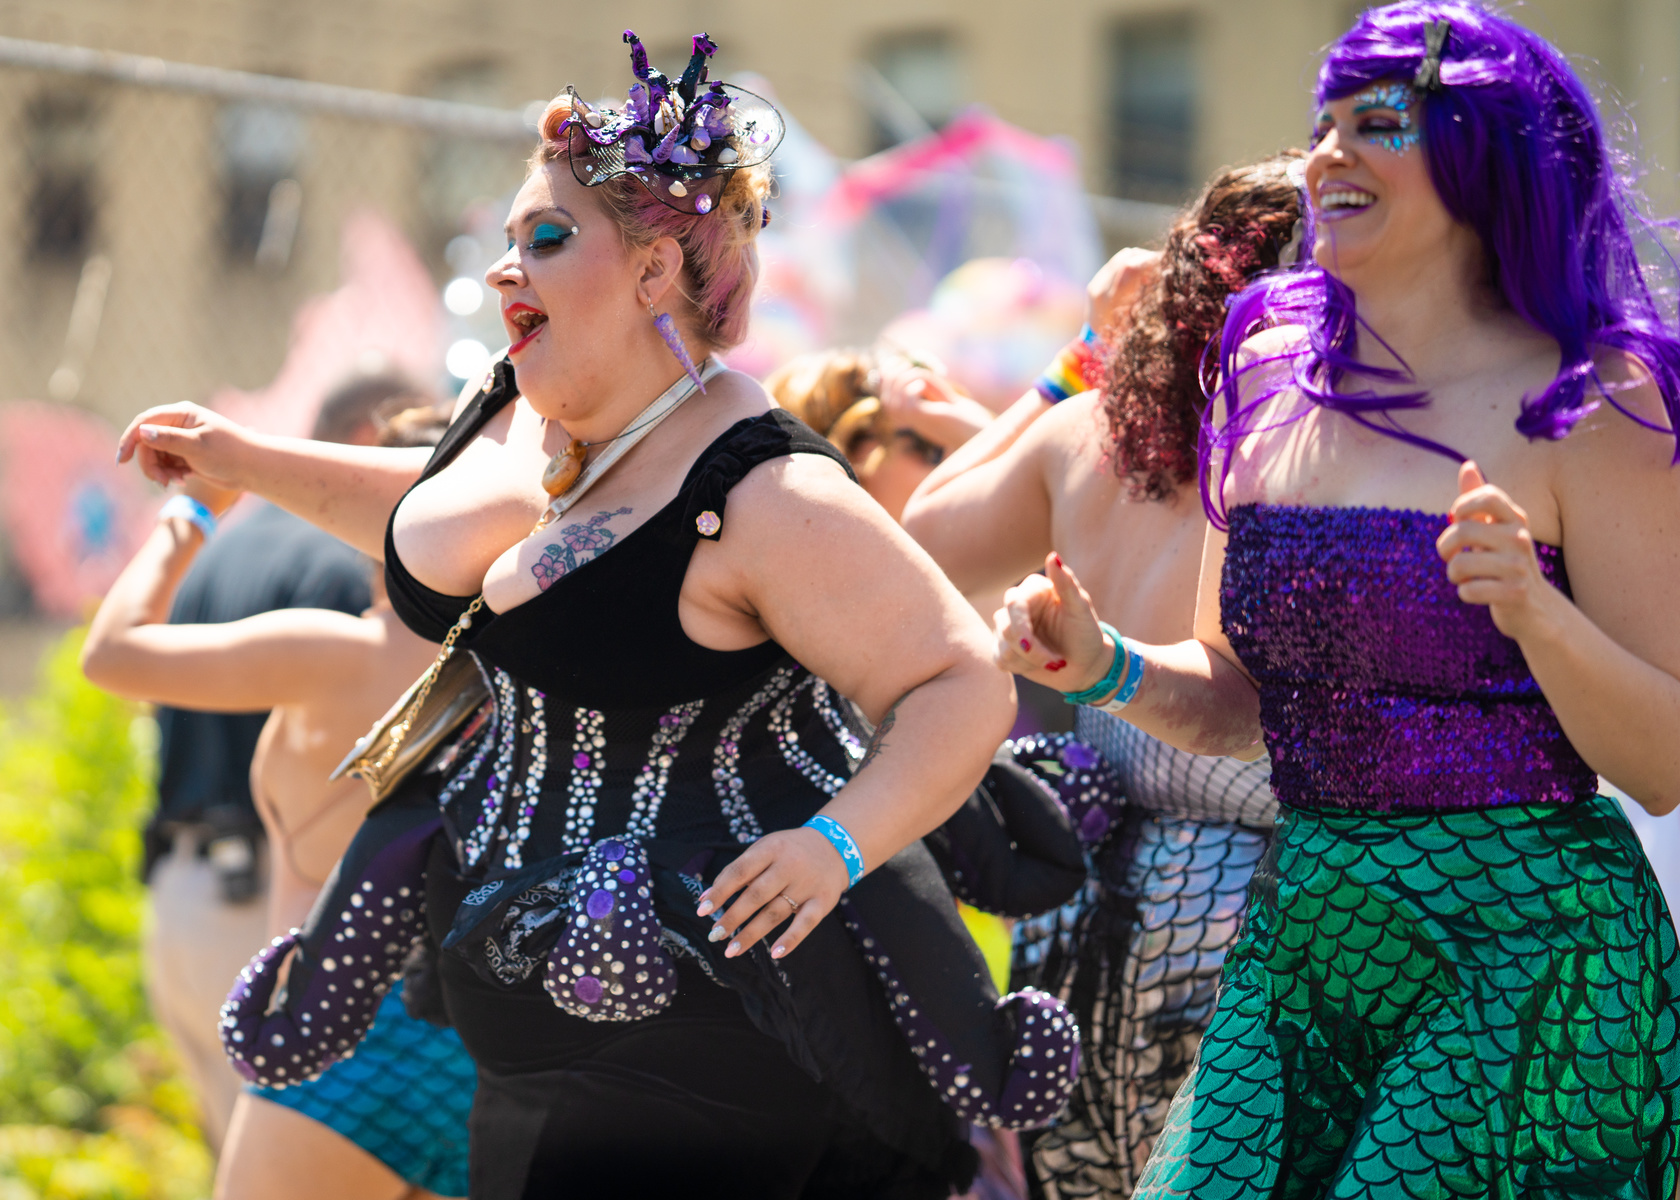 Coney Island Mermaid Parade 2018 (51).jpeg